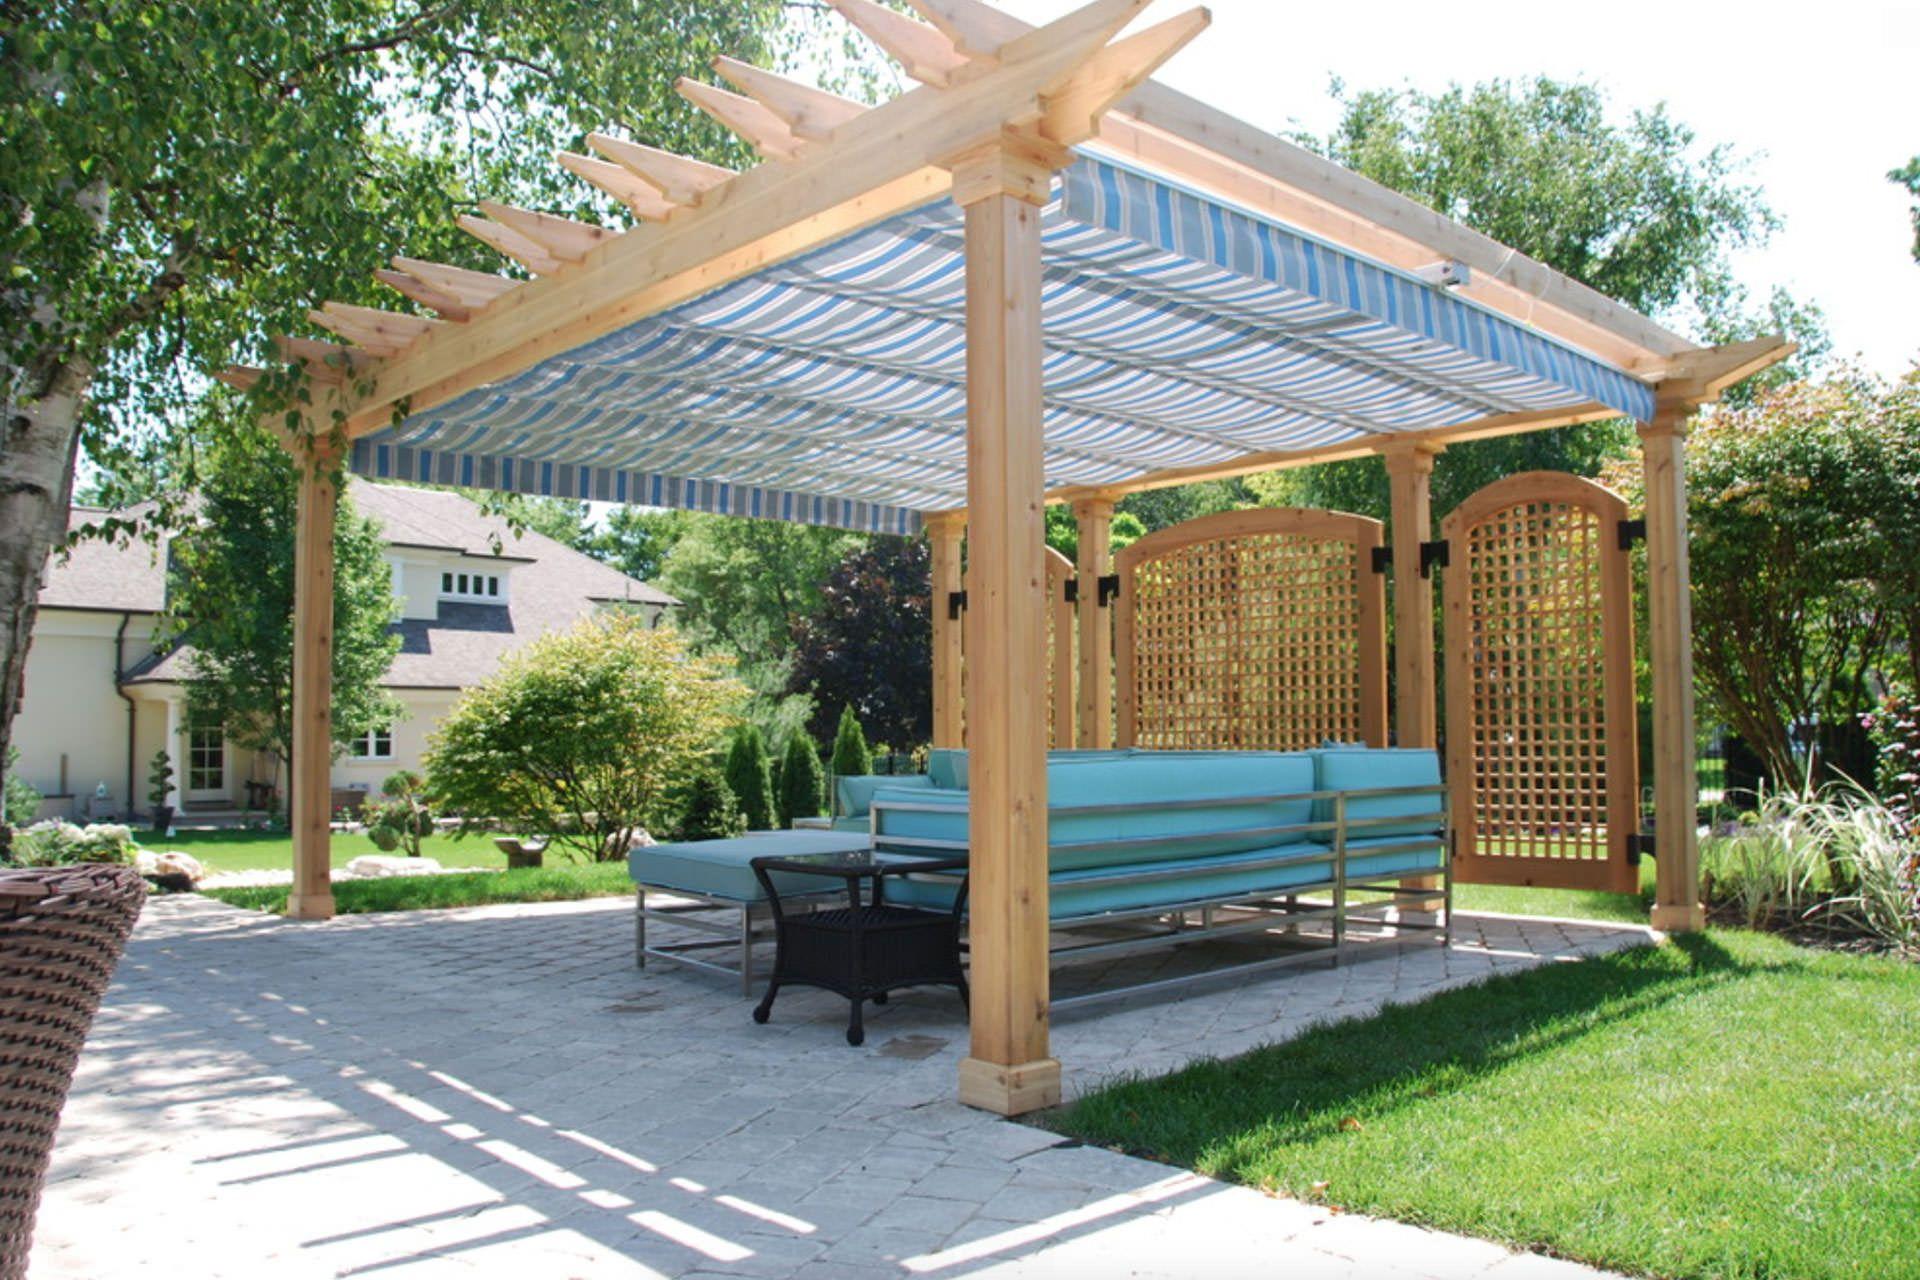 Pergola On Deck Designs Pergola Design Storage And Basement -